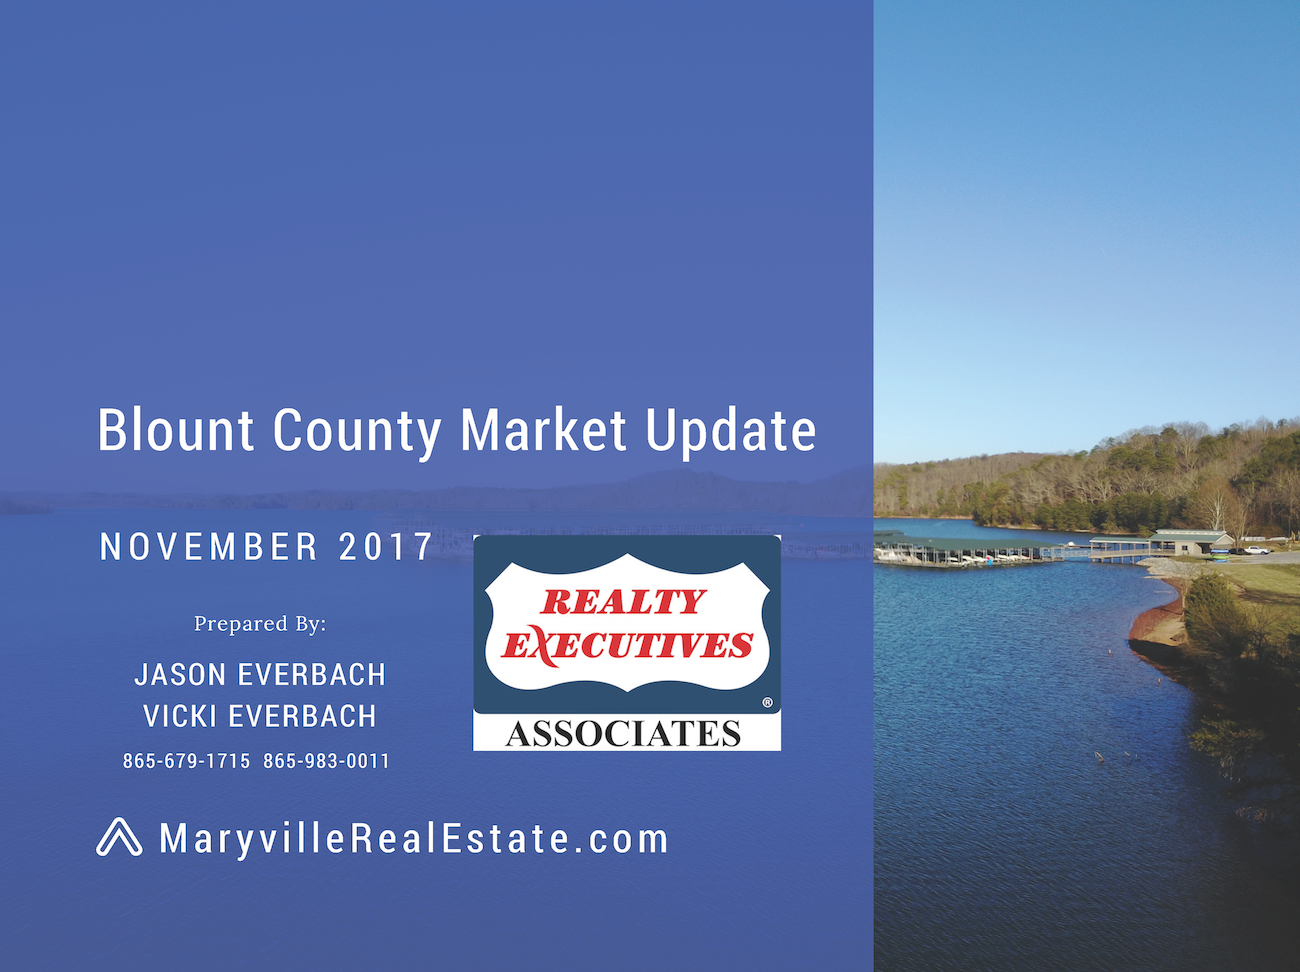 November 2017 Blount County Market Update